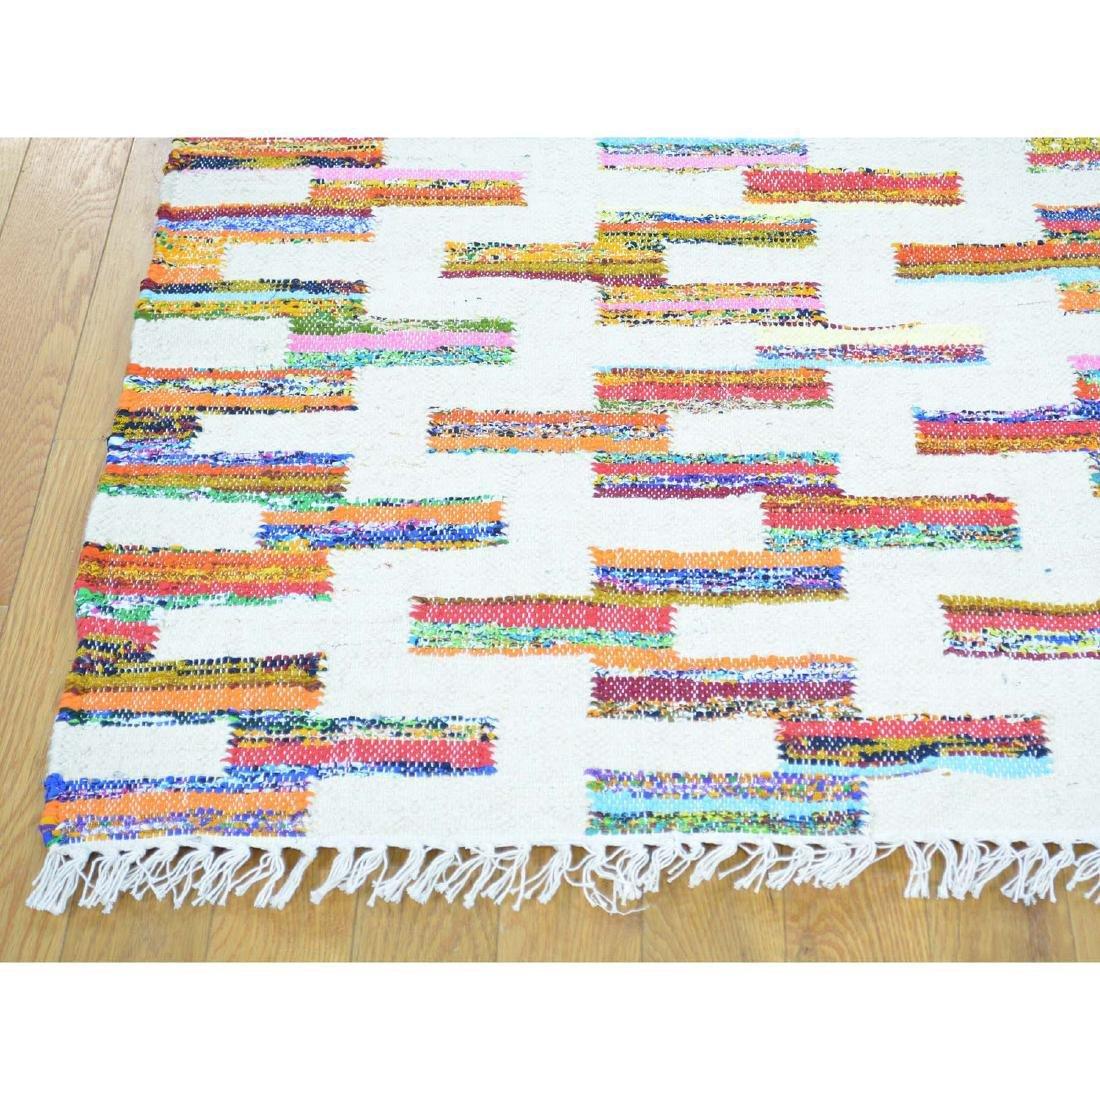 Cotton Sari Silk Flat Weave Kilim Hand Woven Rug 5.x7.1 - 3